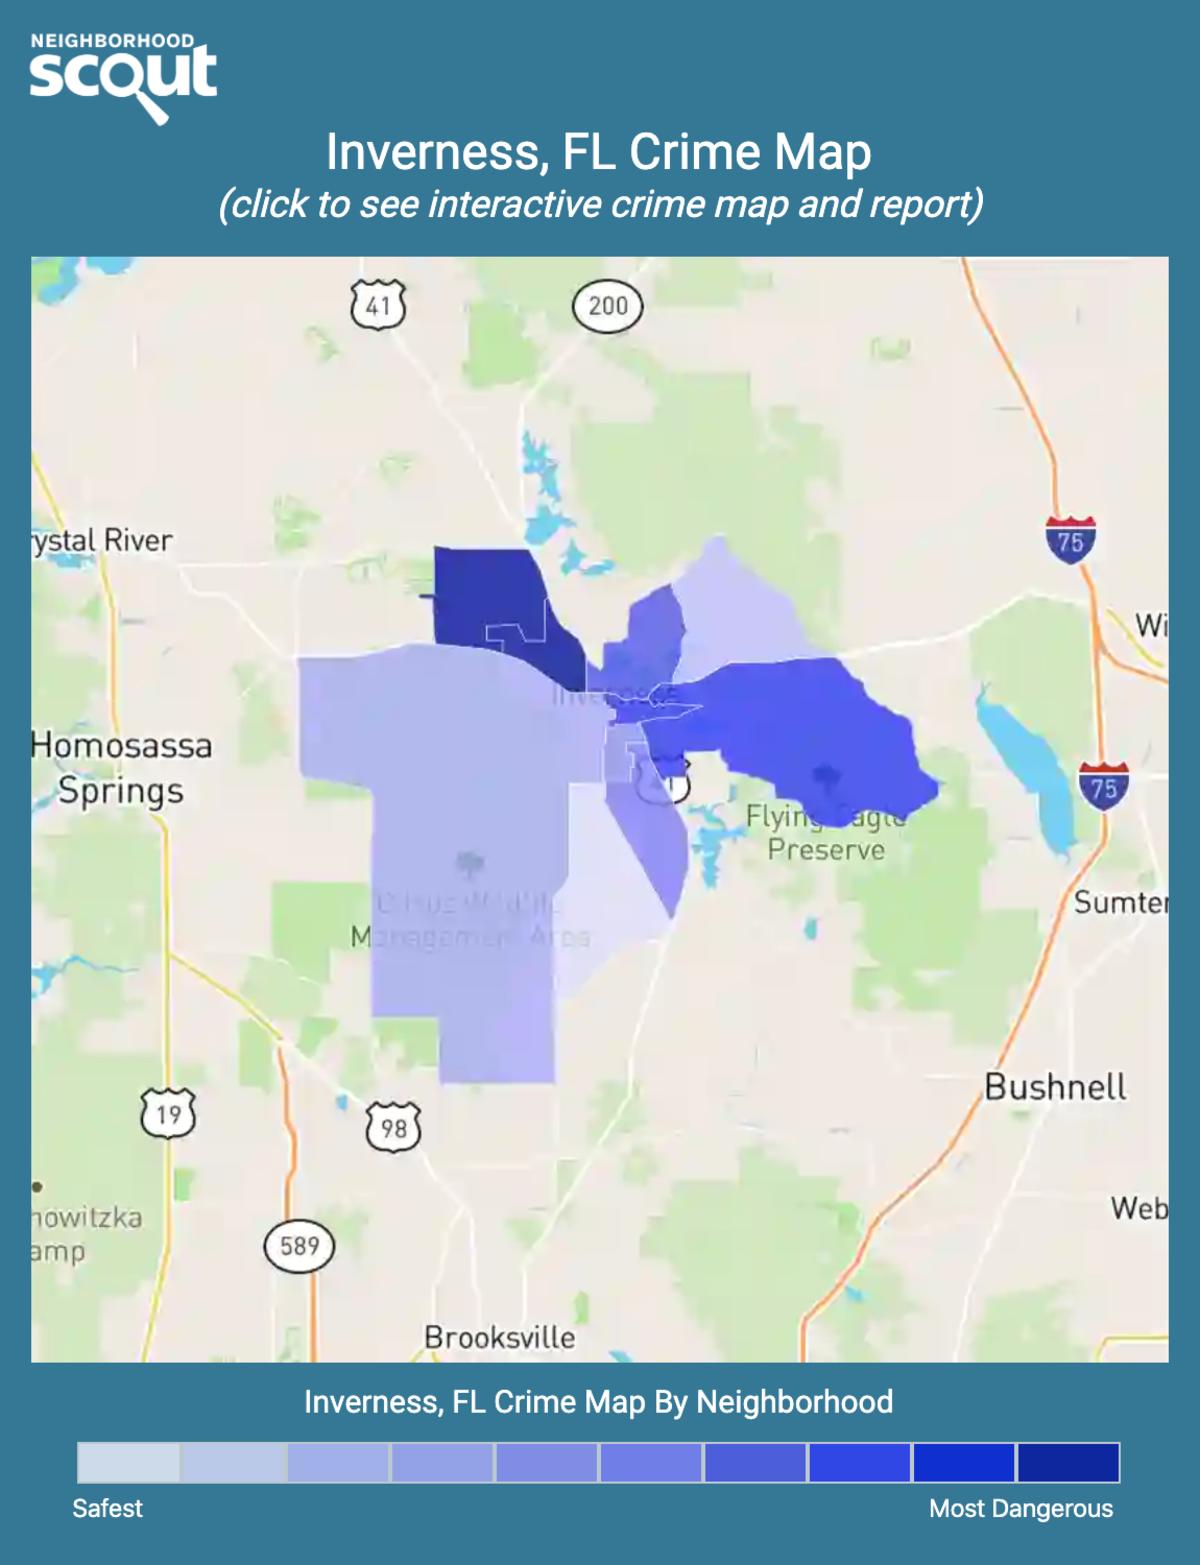 Inverness, Florida crime map